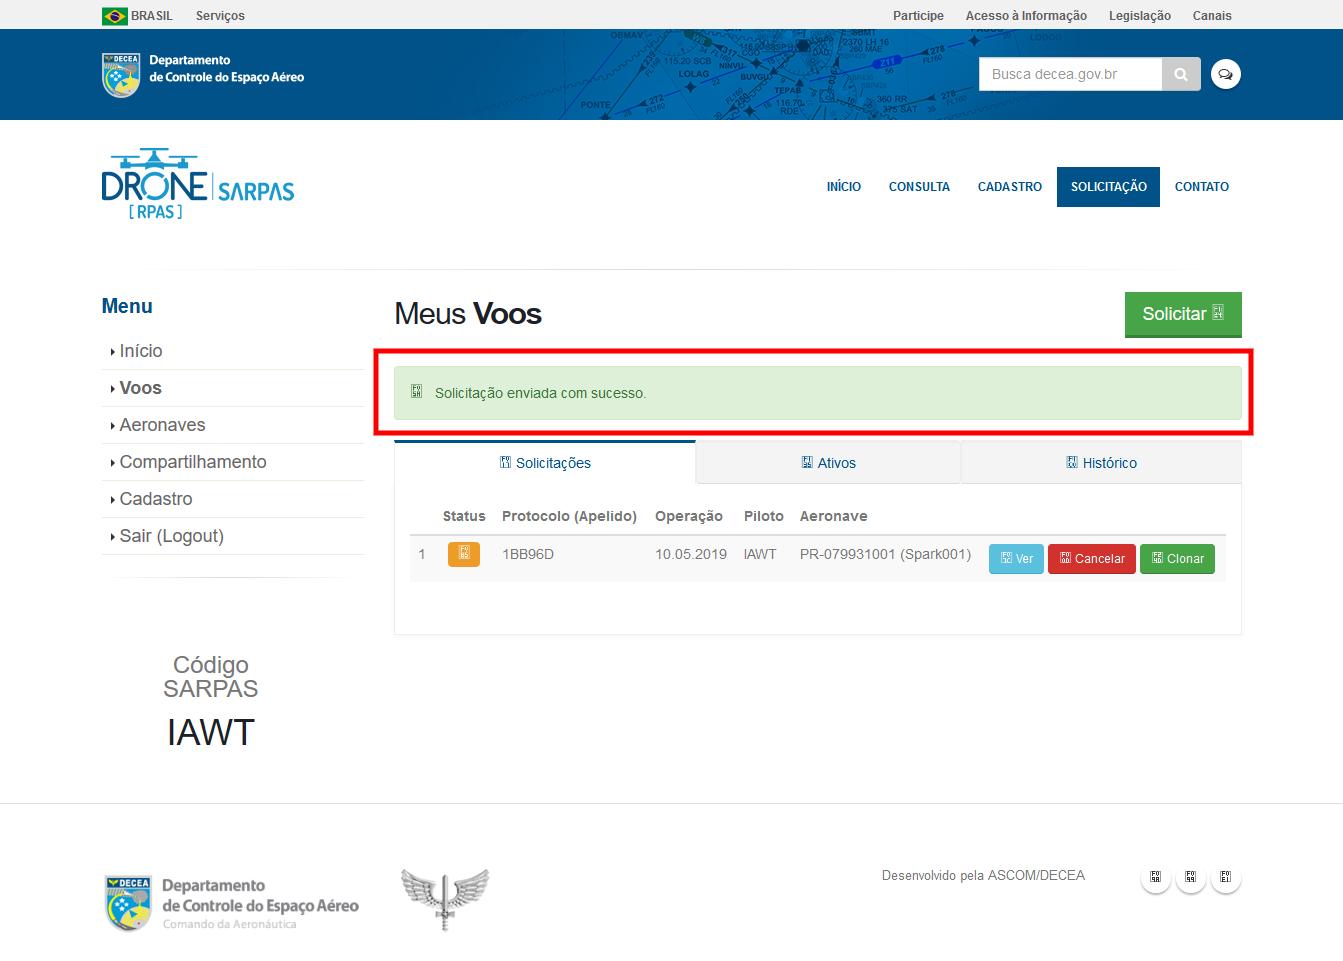 screenshot-servicos.decea.gov.br-2019.05.09-18-48-43.png